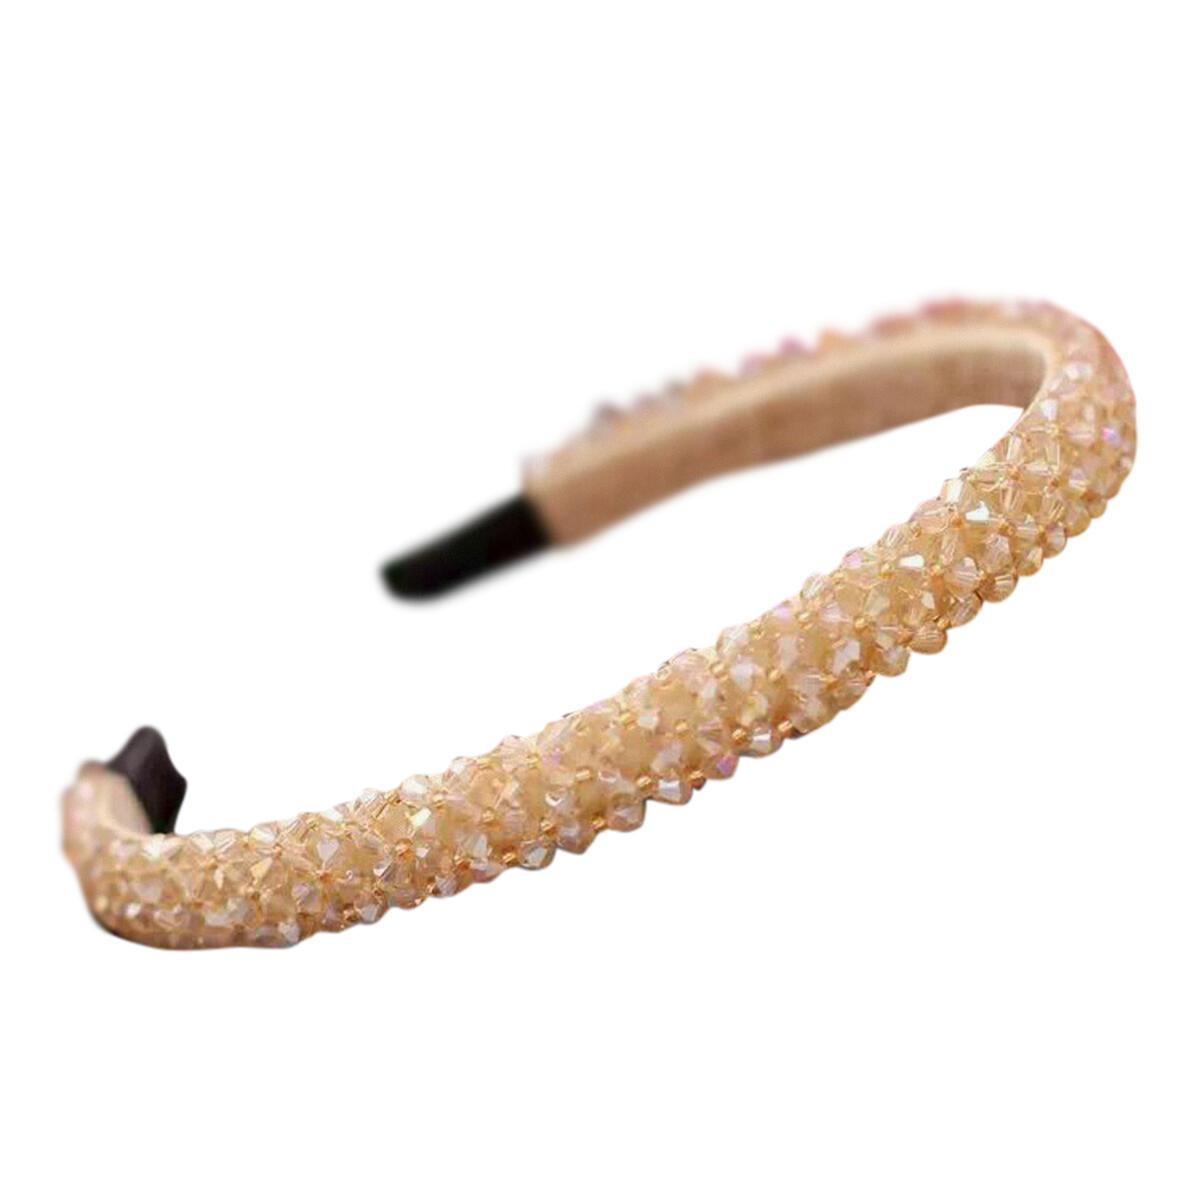 Handmade Crystal Rhinestone Headband for Women – 4 Row Beaded Shiny Ladies Accessories Hair Bling – Fashionable Crystal Headband with matching Crystal Hairband and Drawstring bag